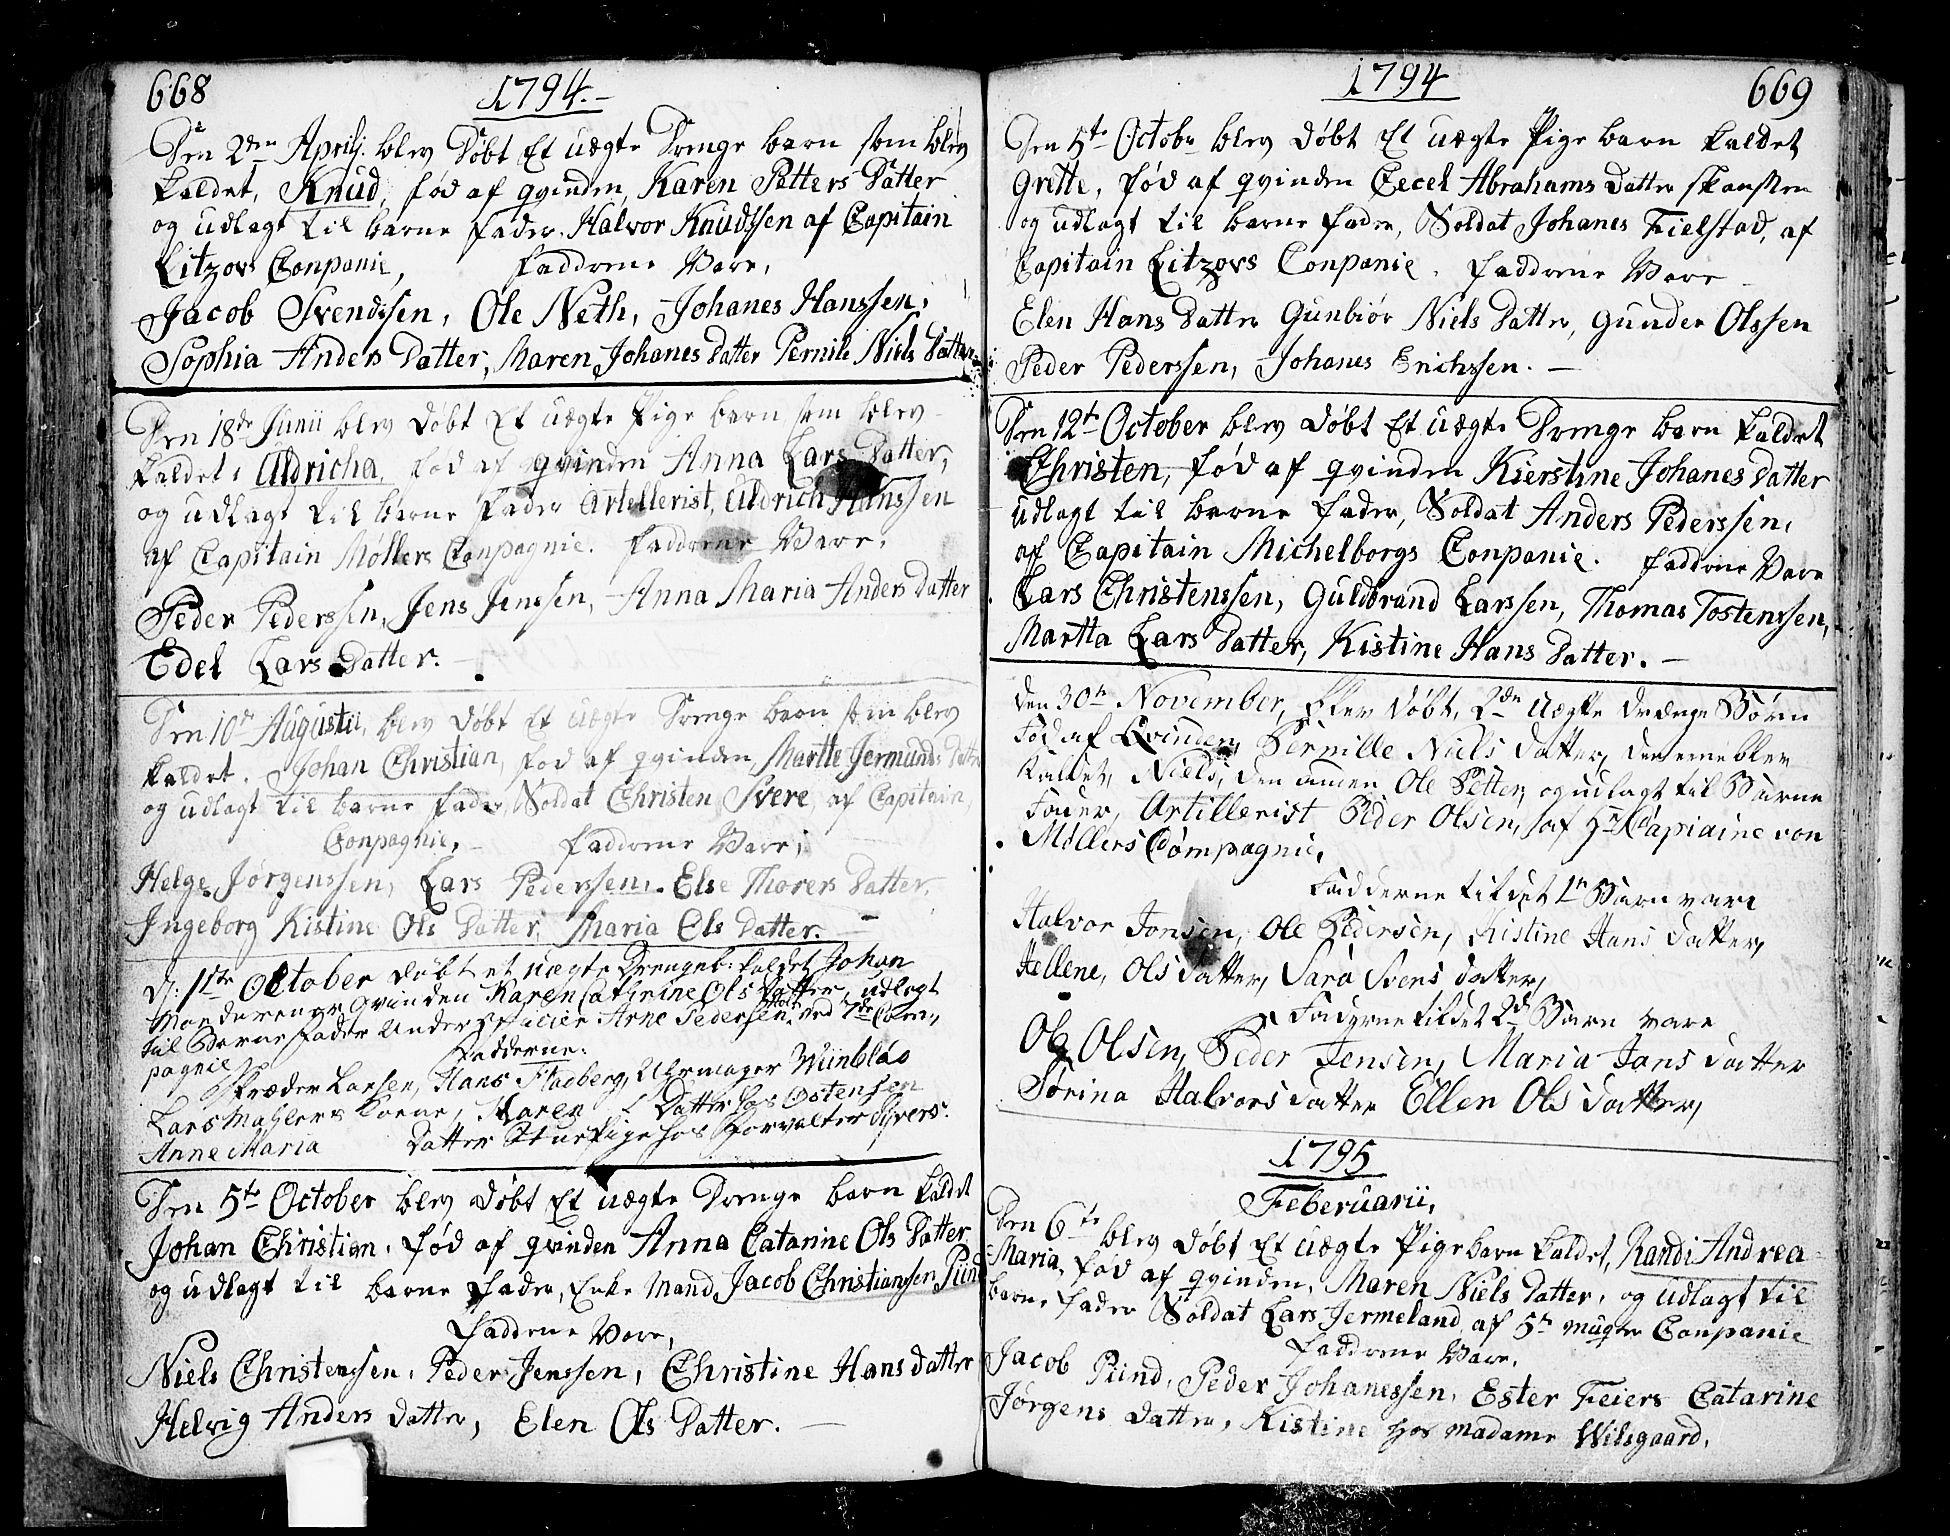 SAO, Fredrikstad prestekontor Kirkebøker, F/Fa/L0002: Ministerialbok nr. 2, 1750-1804, s. 668-669